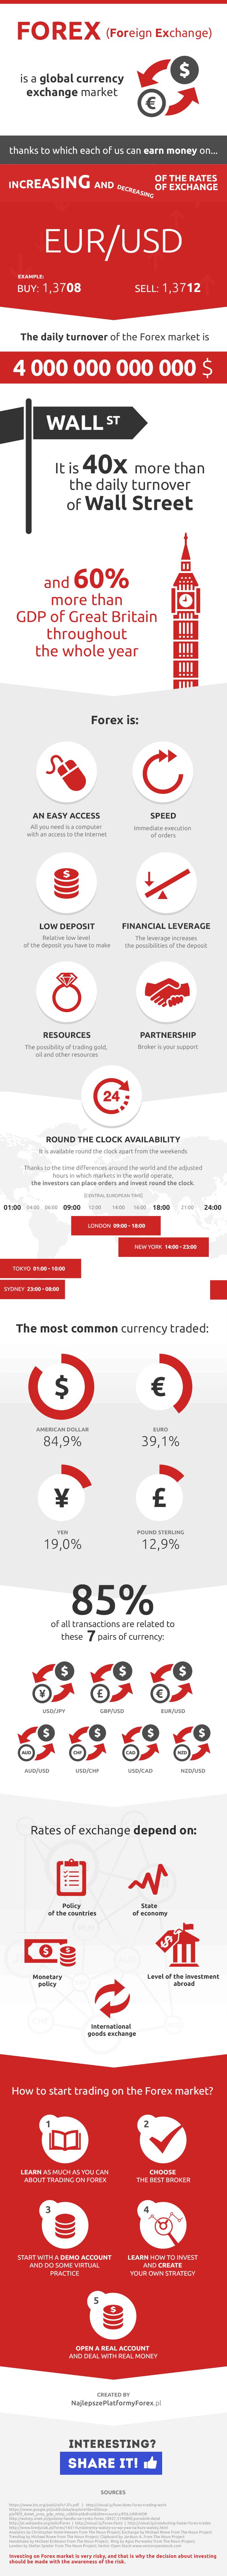 infografika forex po angielsku